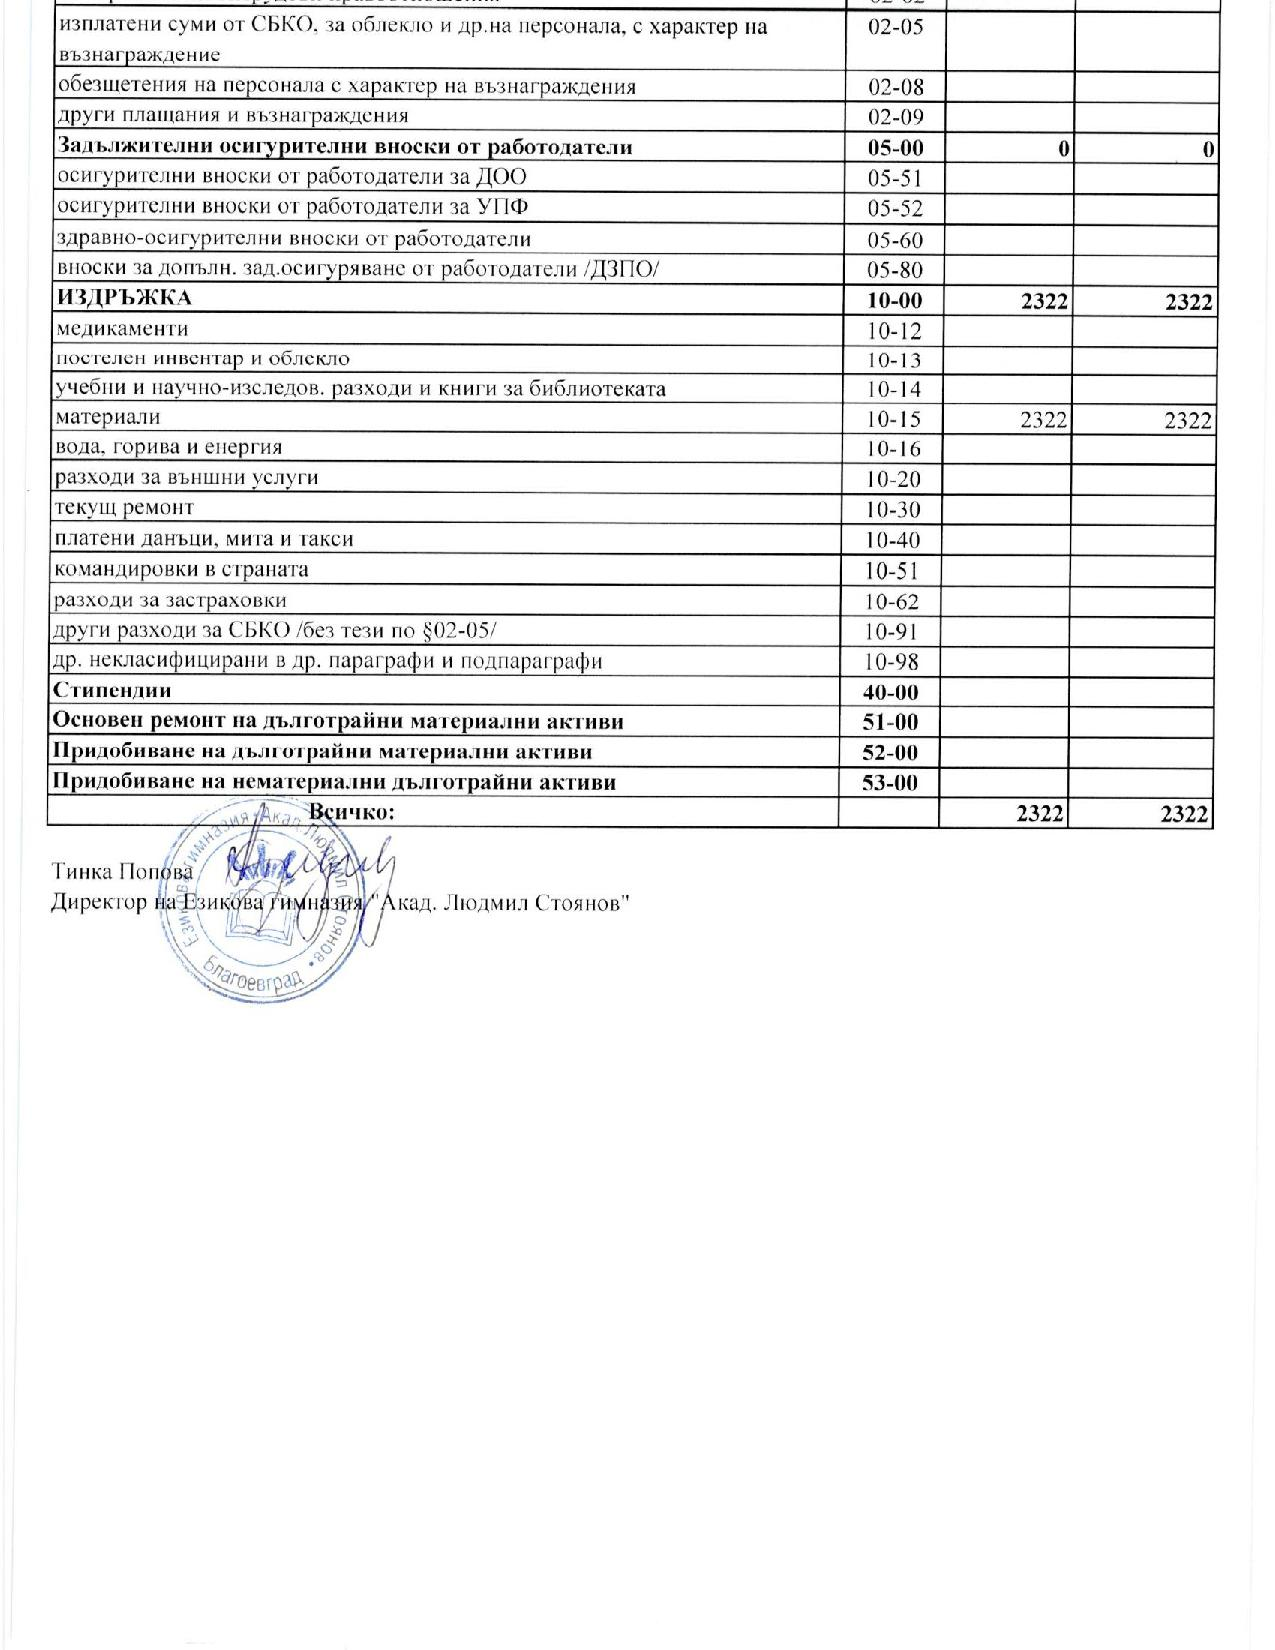 eg page 011